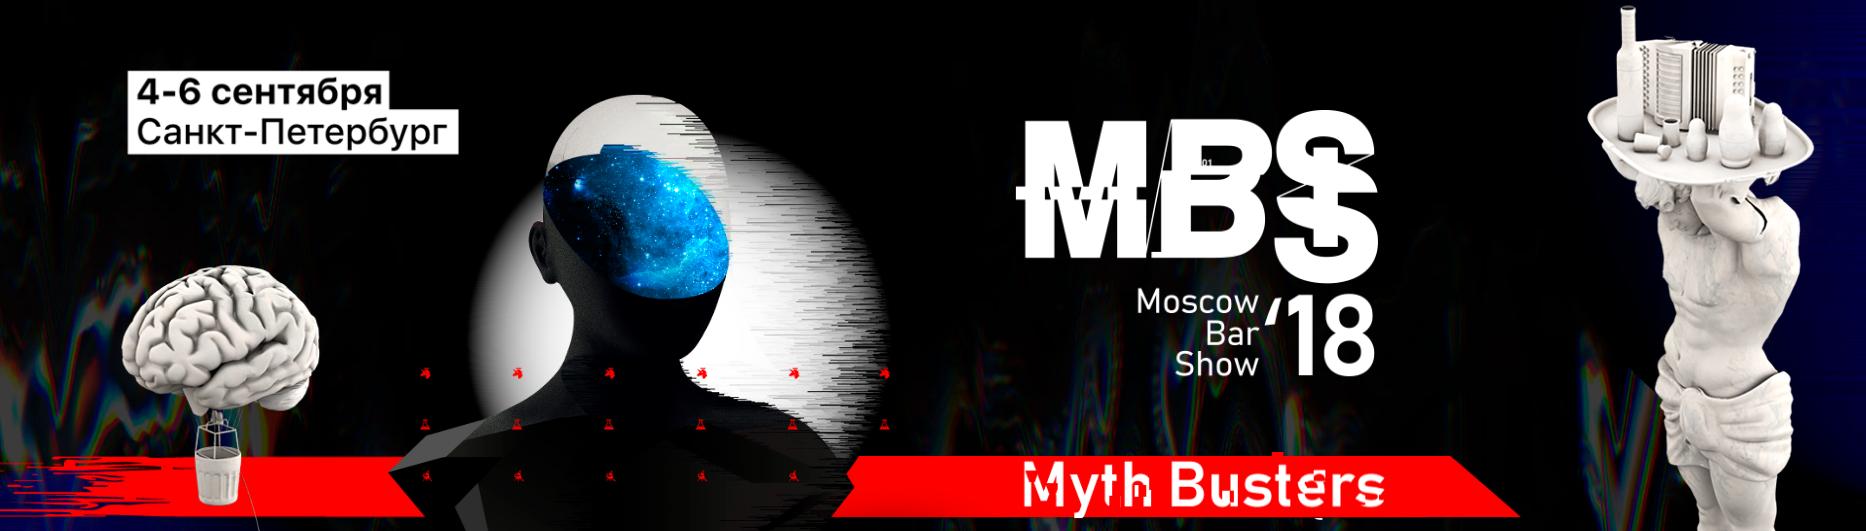 выставка МБС афиша разрушители мифов